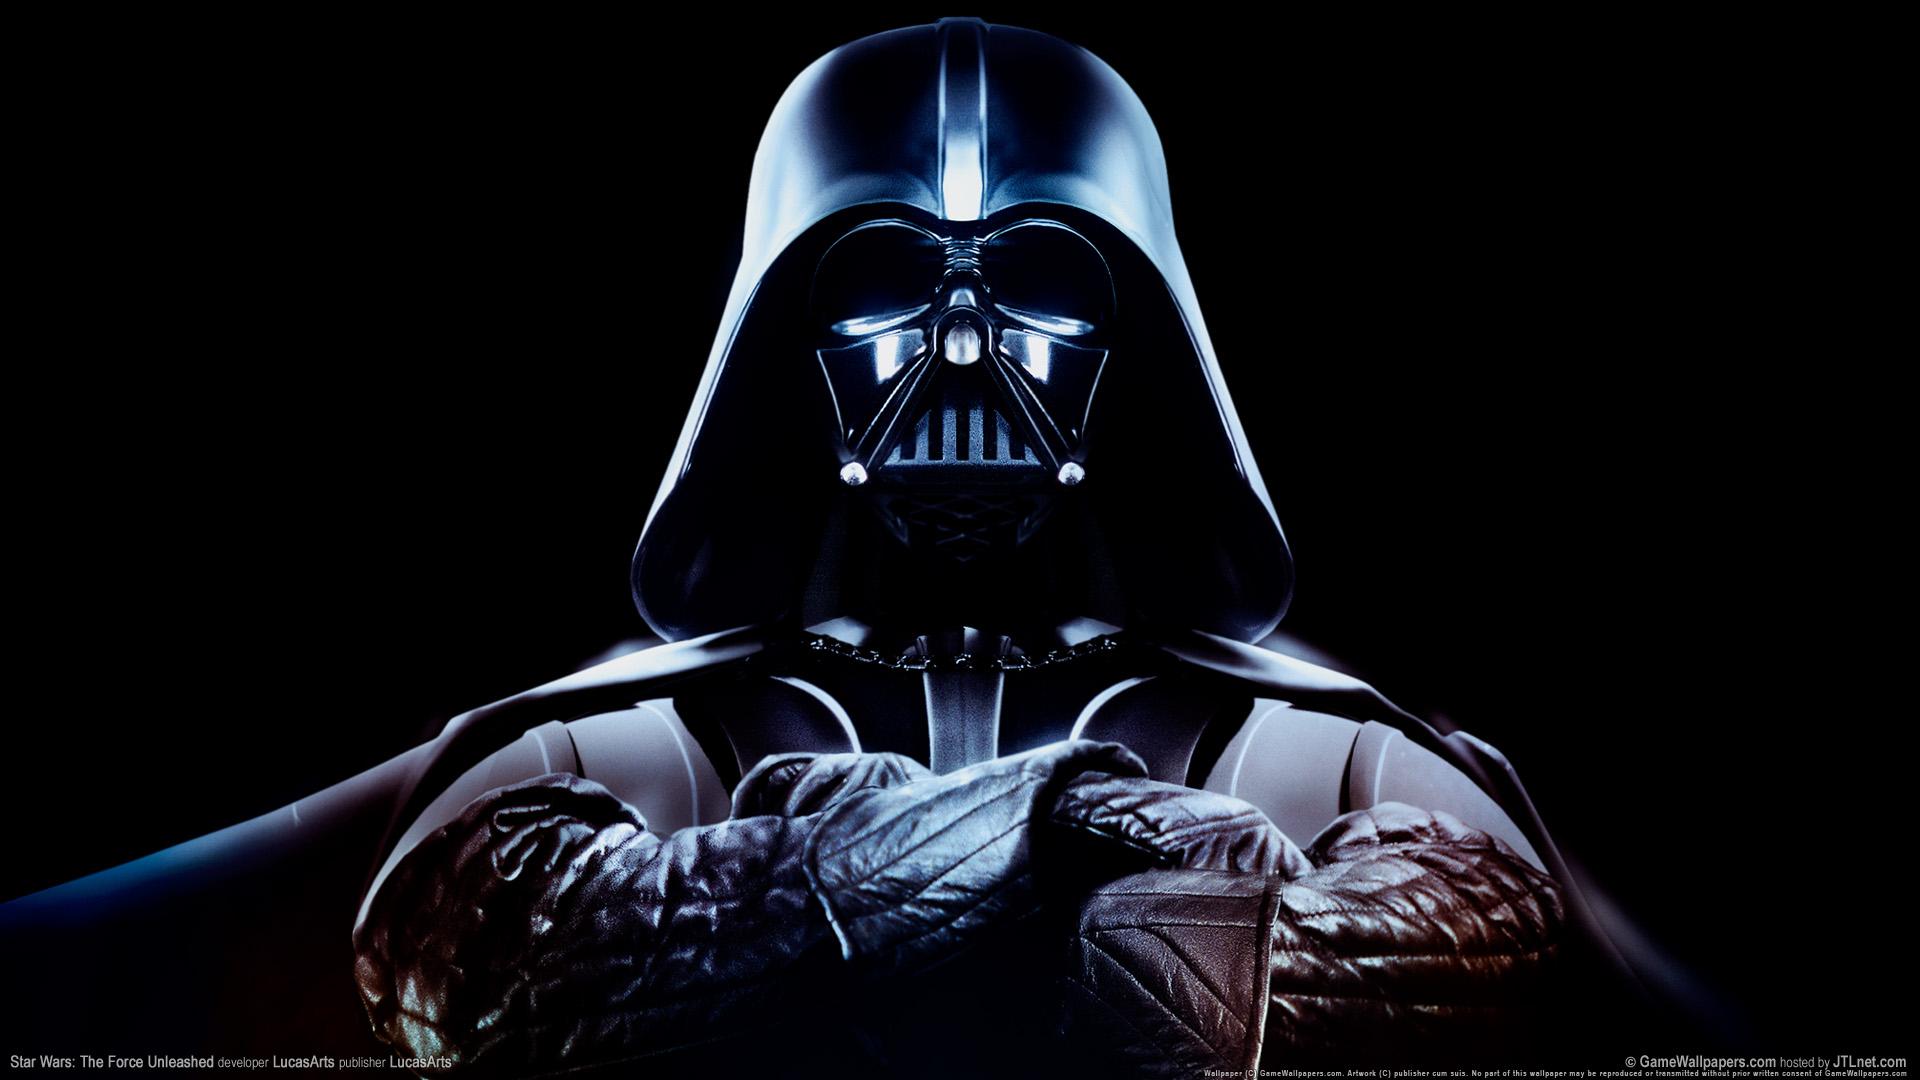 Classical Wallpaper  Darth Vader   Star Wars Wallpaper 25852934 1920x1080